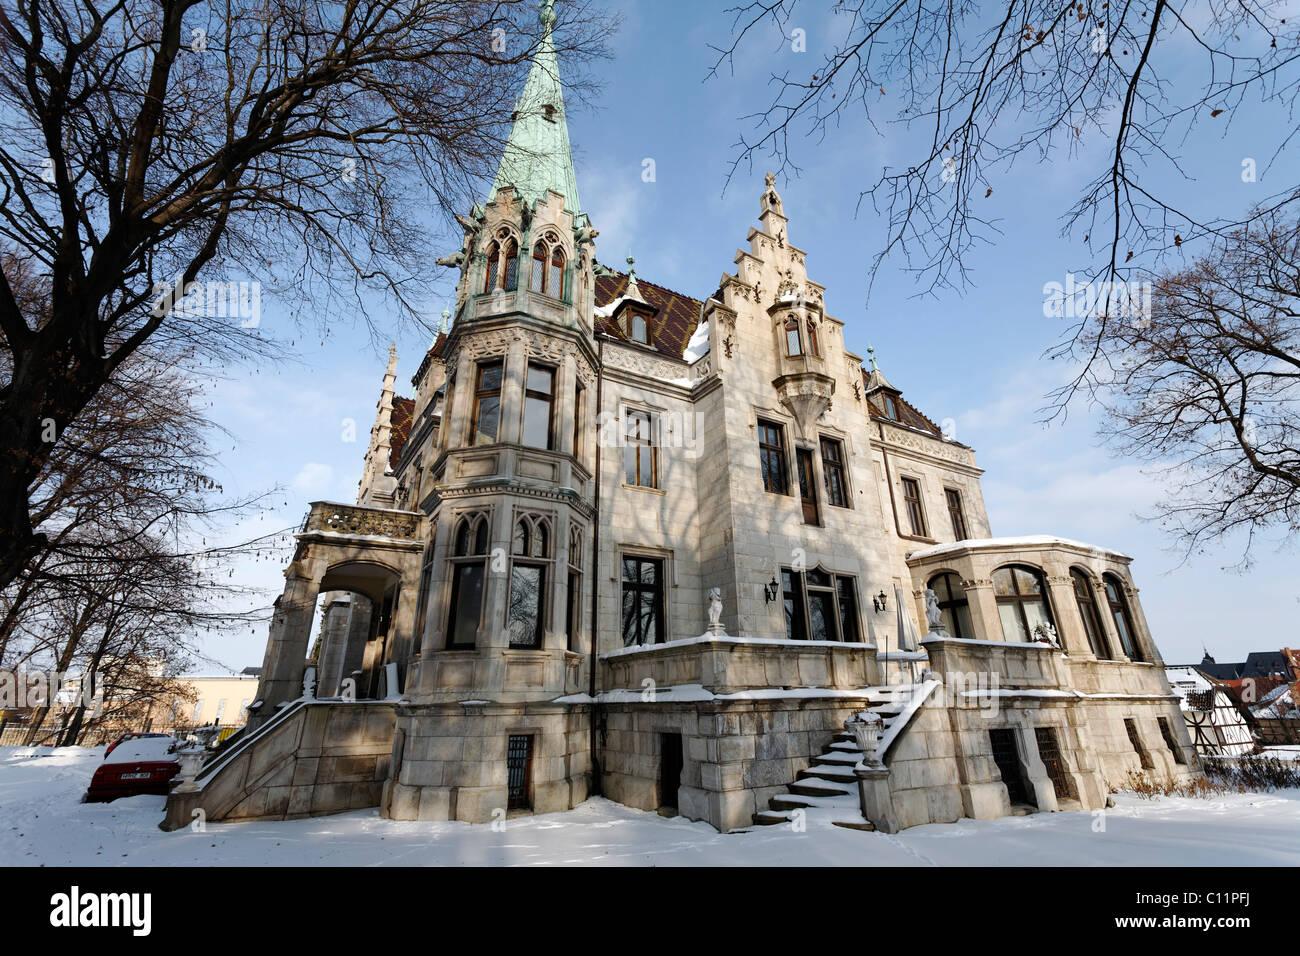 Pompous Villa In Neo Gothic Style Zum Marquis Castle Hotel Quedlinburg Harz Saxony Anhalt Germany Europe